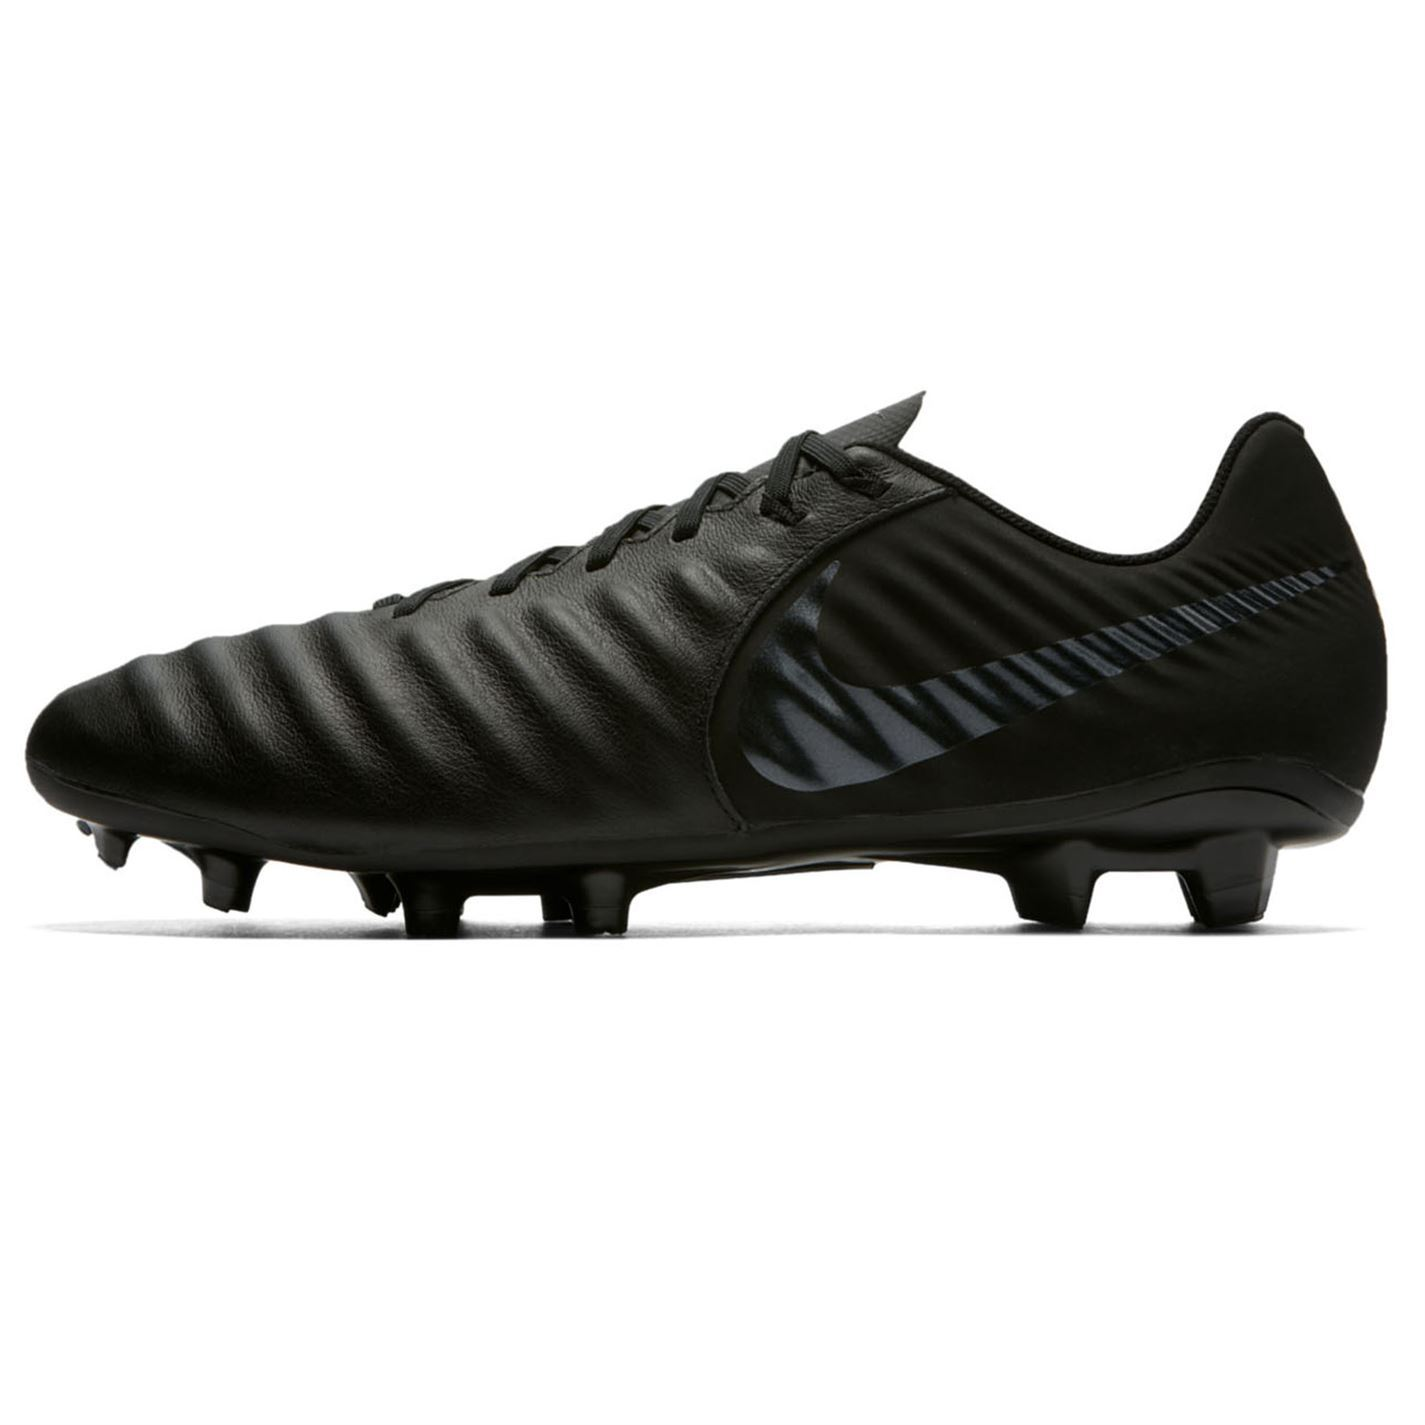 miniature 6 - Nike-Tiempo-Legend-Academy-FG-Firm-Ground-Chaussures-De-Football-Homme-Football-Chaussures-Crampons